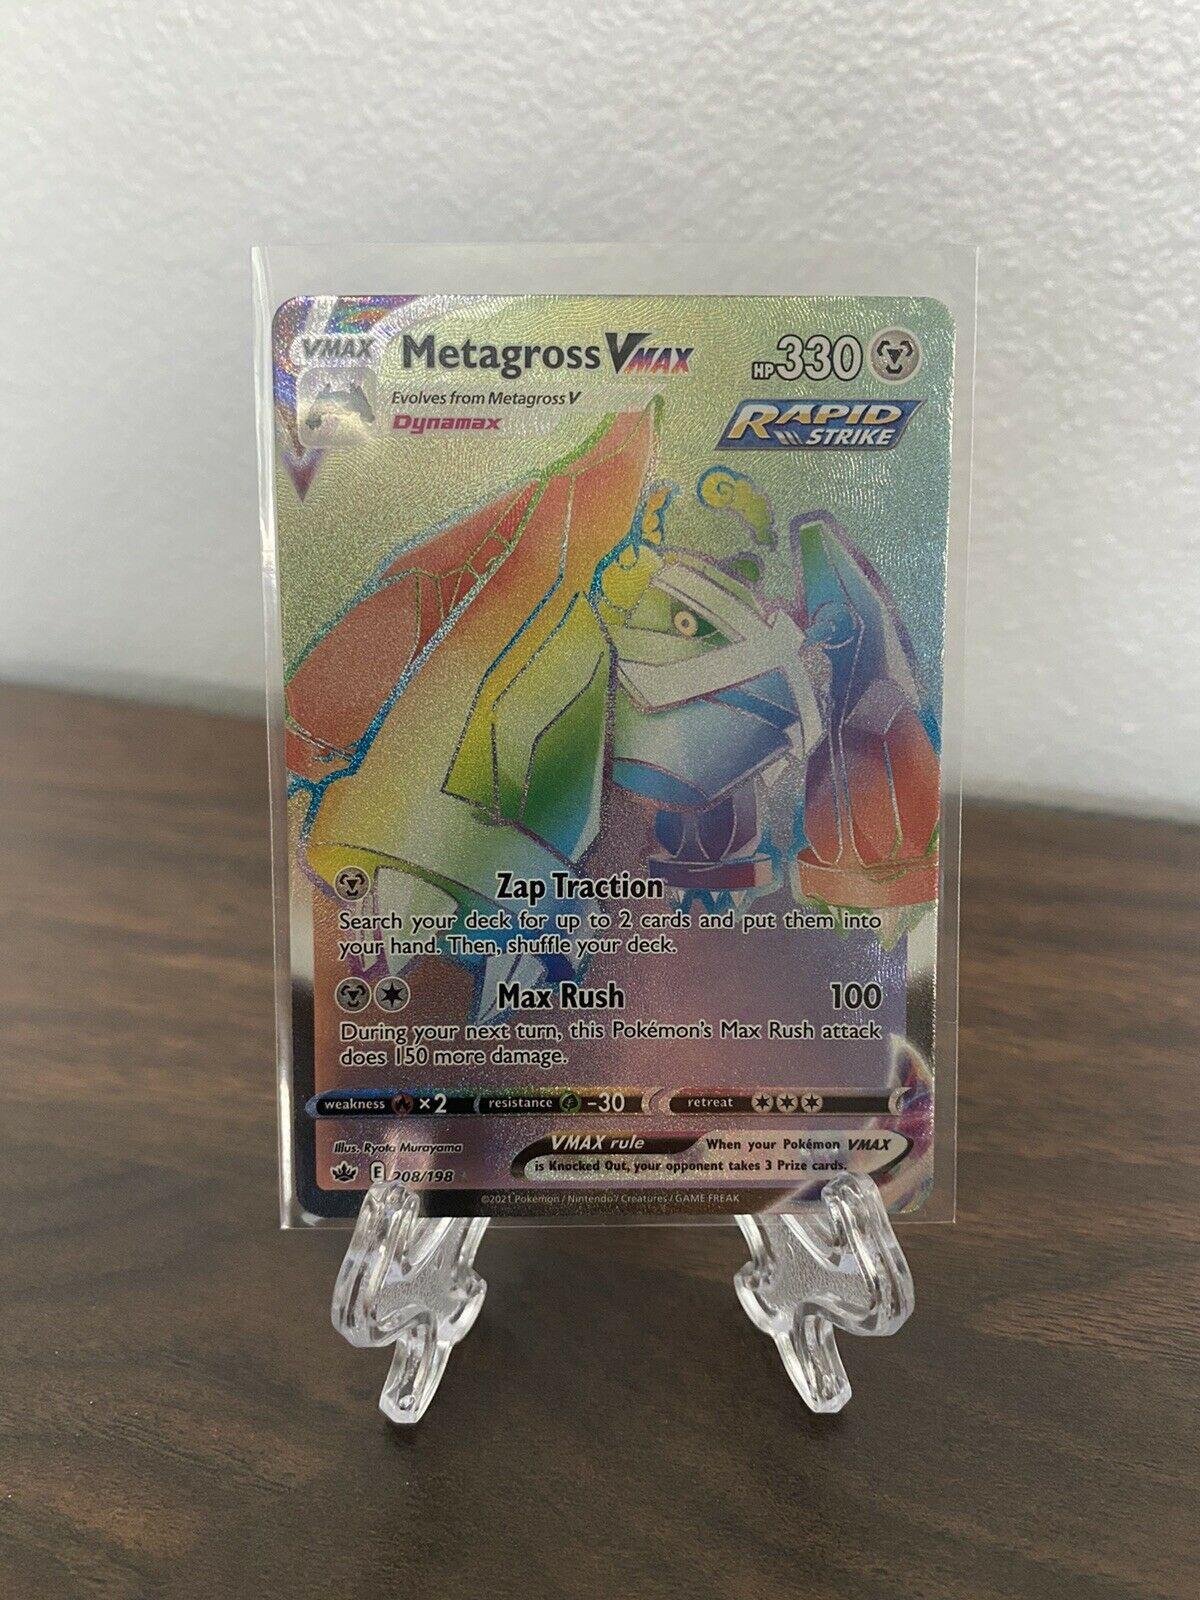 Metagross VMAX Chilling Reign 208/198 Rainbow Secret Rare Pokémon Card NM/M - Image 1